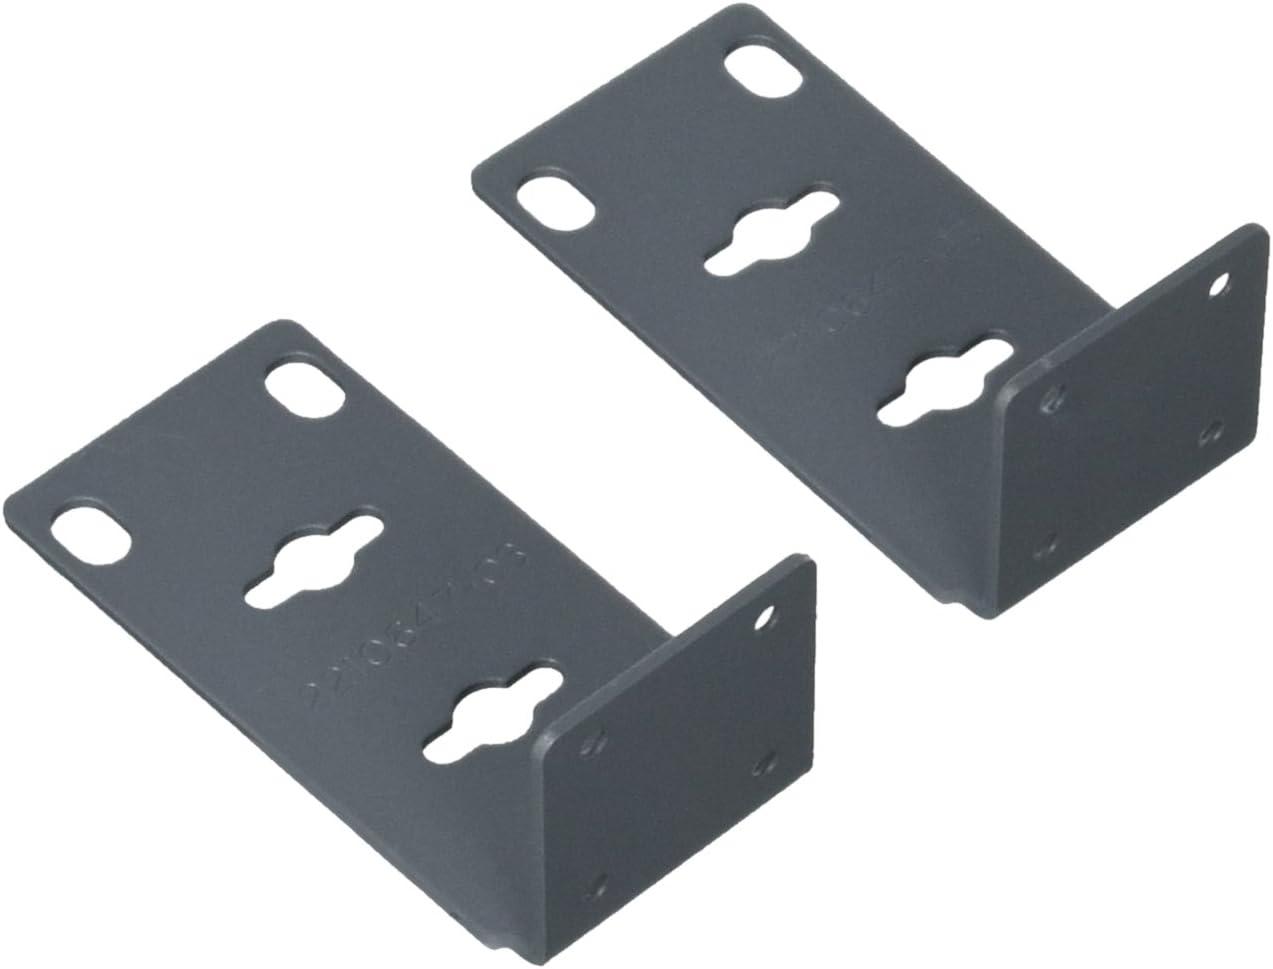 Boston Mall HP JW086A Aruba - Network for Device Cheap sale mounting kit 7030